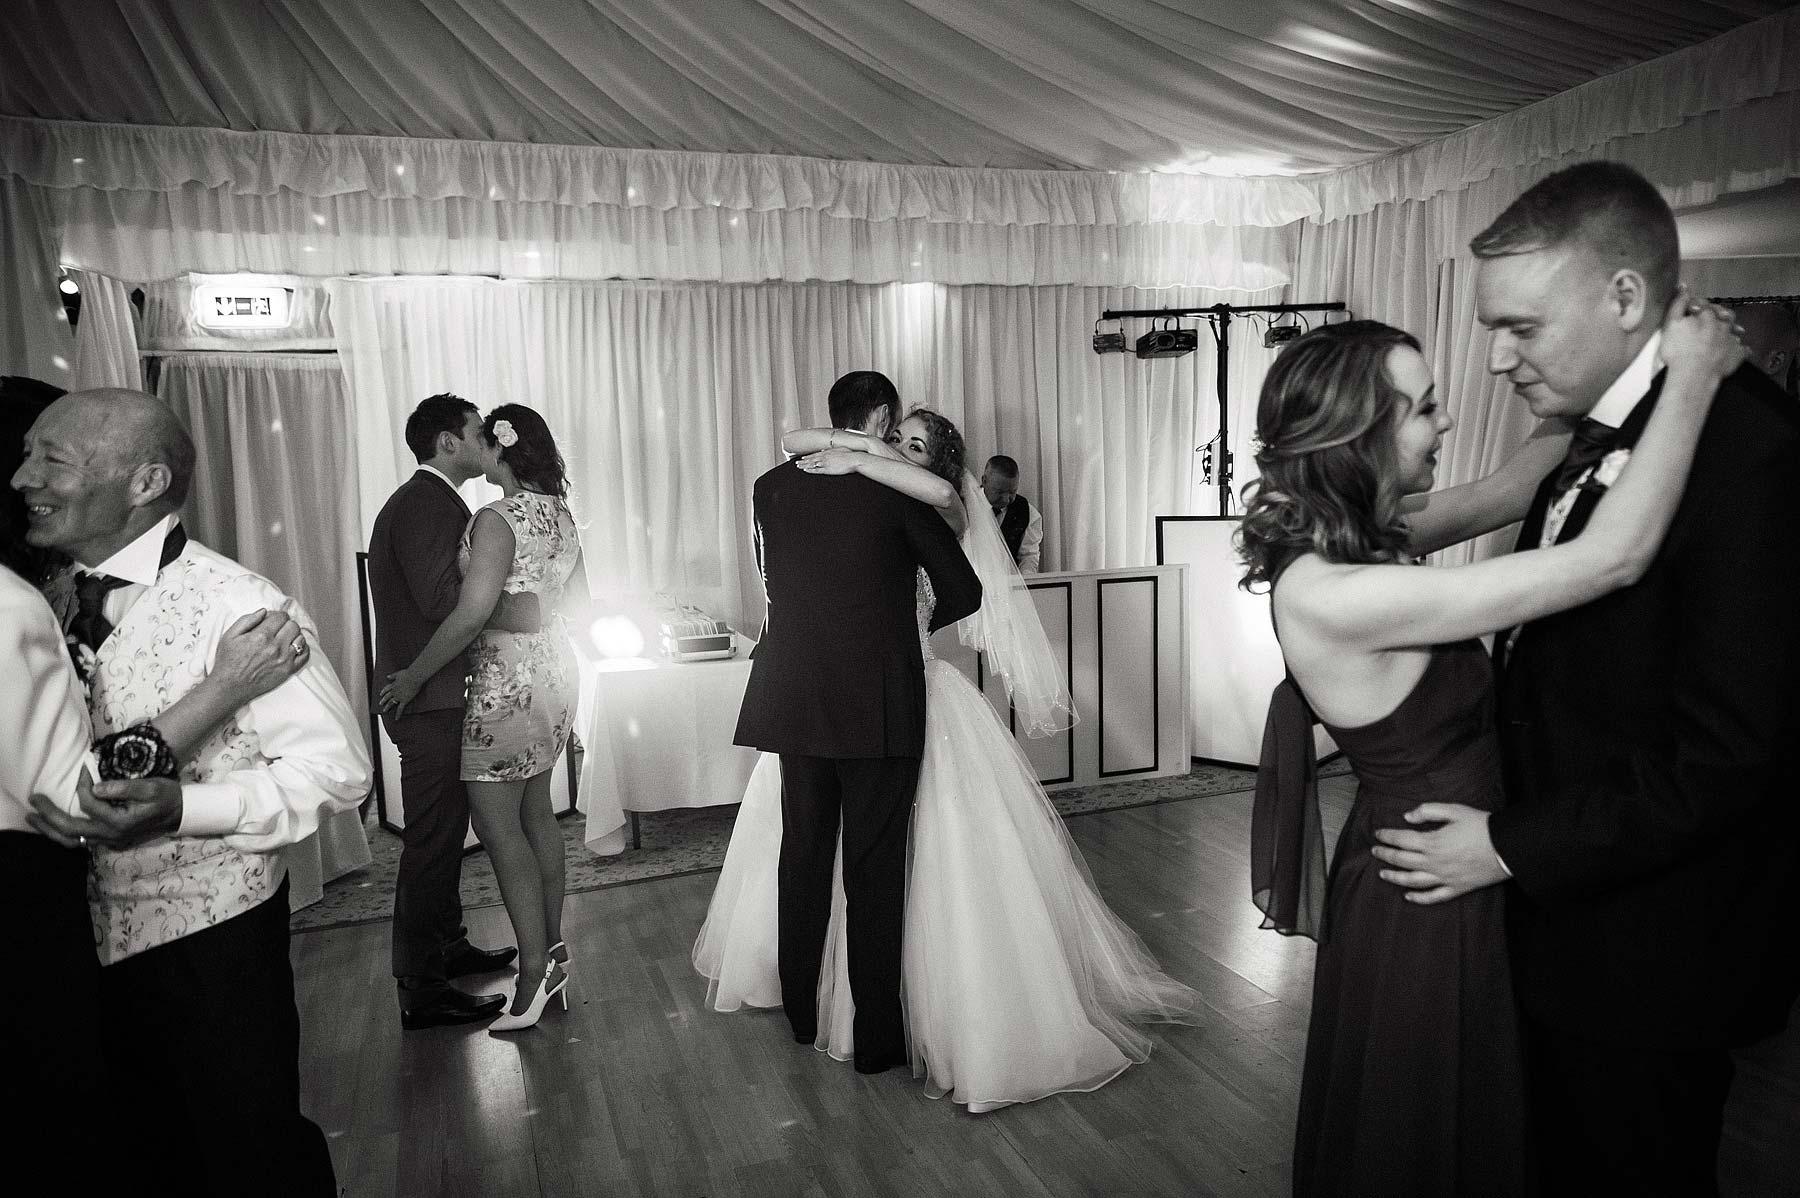 albright-hussey-manor-wedding-photographers-069